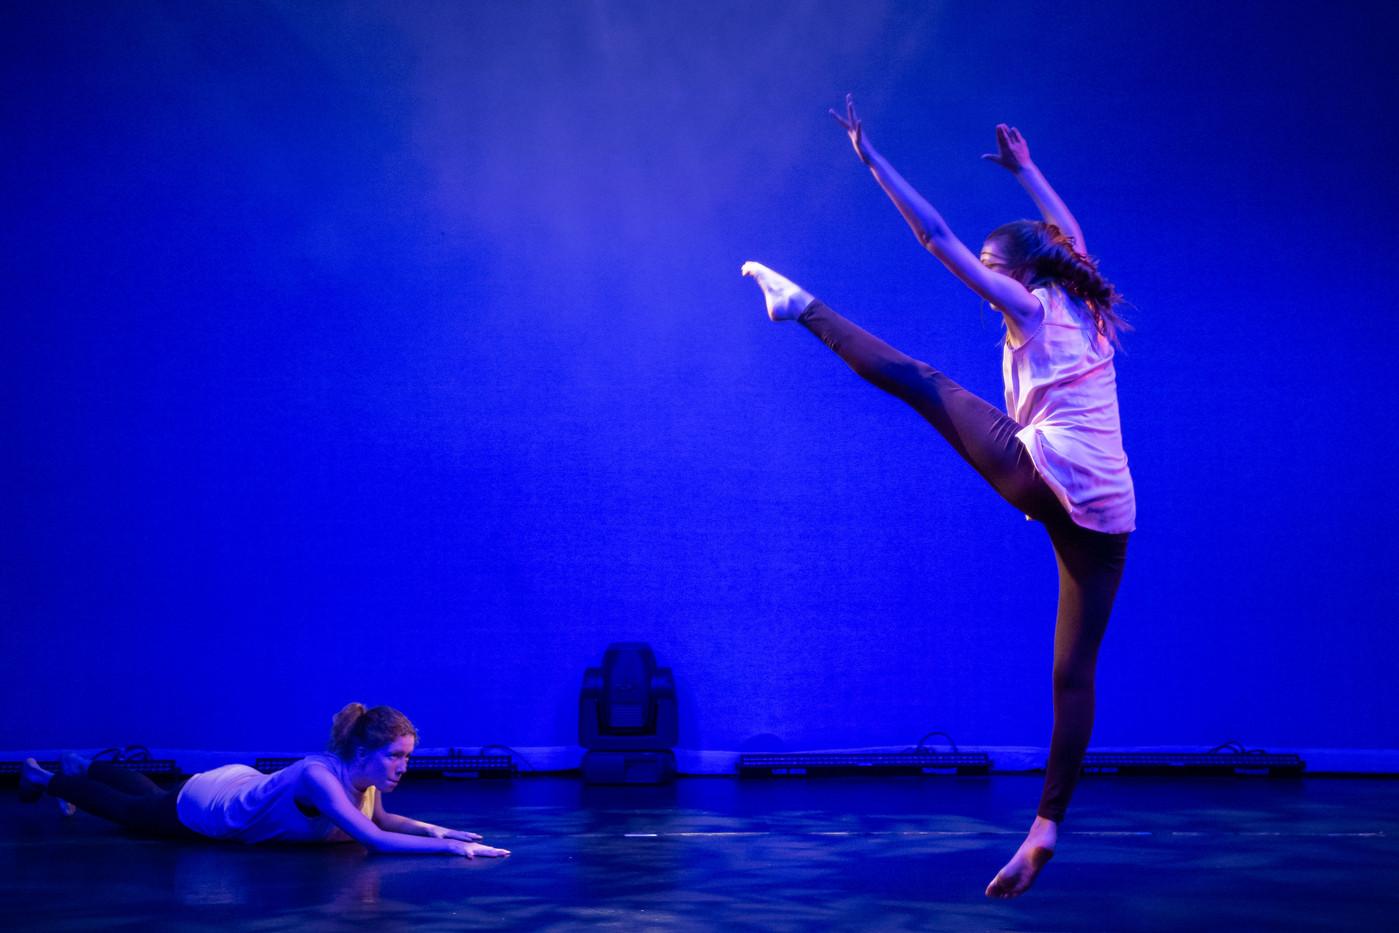 Thrive Youth Dance Company